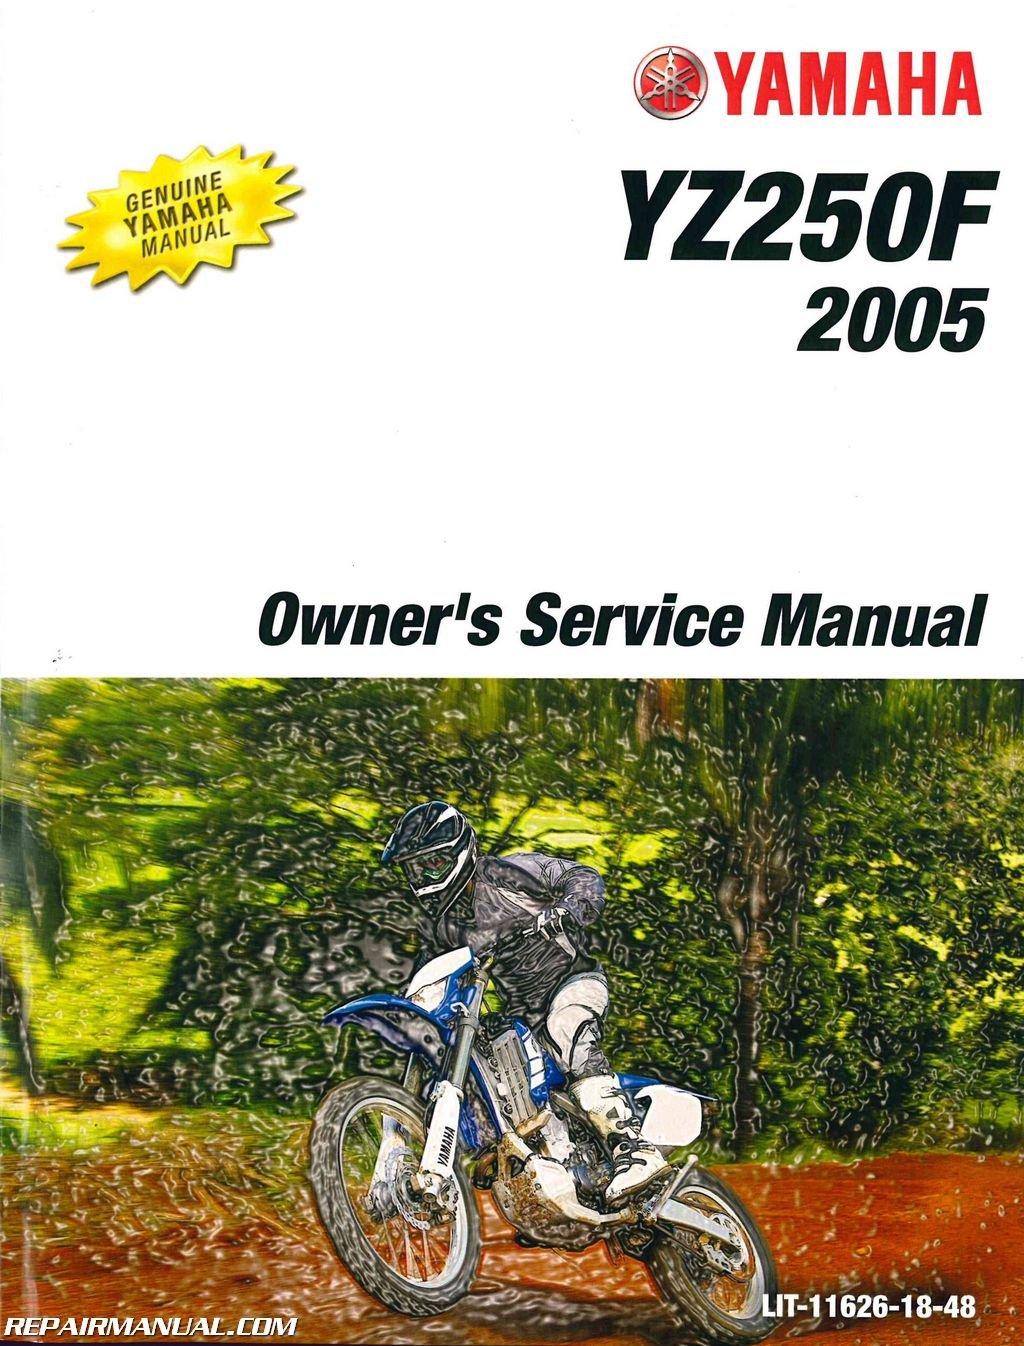 LIT-11626-18-48 2005 Yamaha YZ250F Owners Motorcycle Service Manual:  Manufacturer: Amazon.com: Books